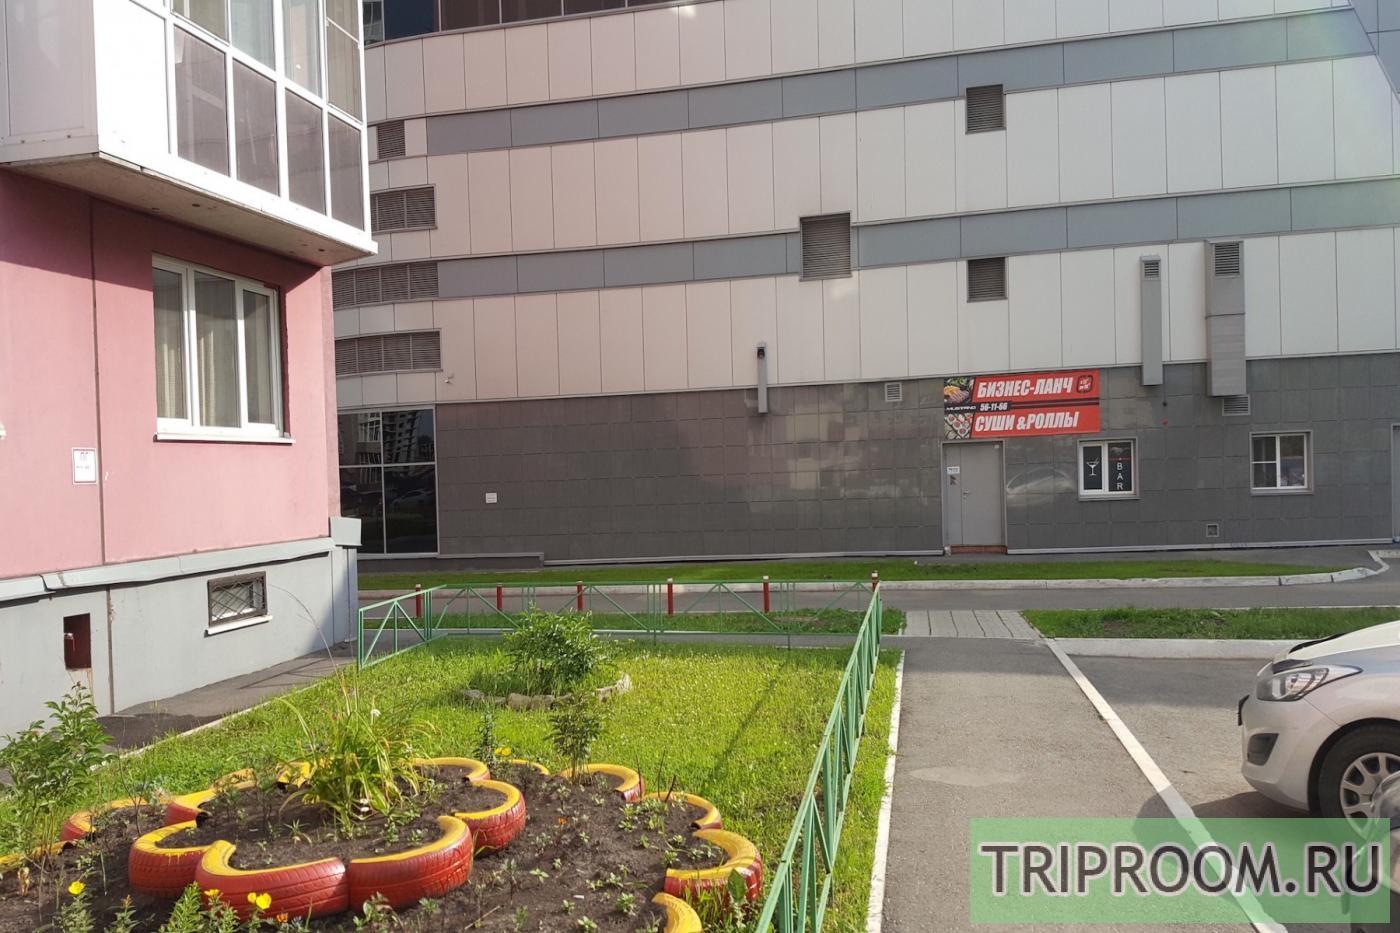 1-комнатная квартира посуточно (вариант № 30838), ул. Ермакова улица, фото № 4